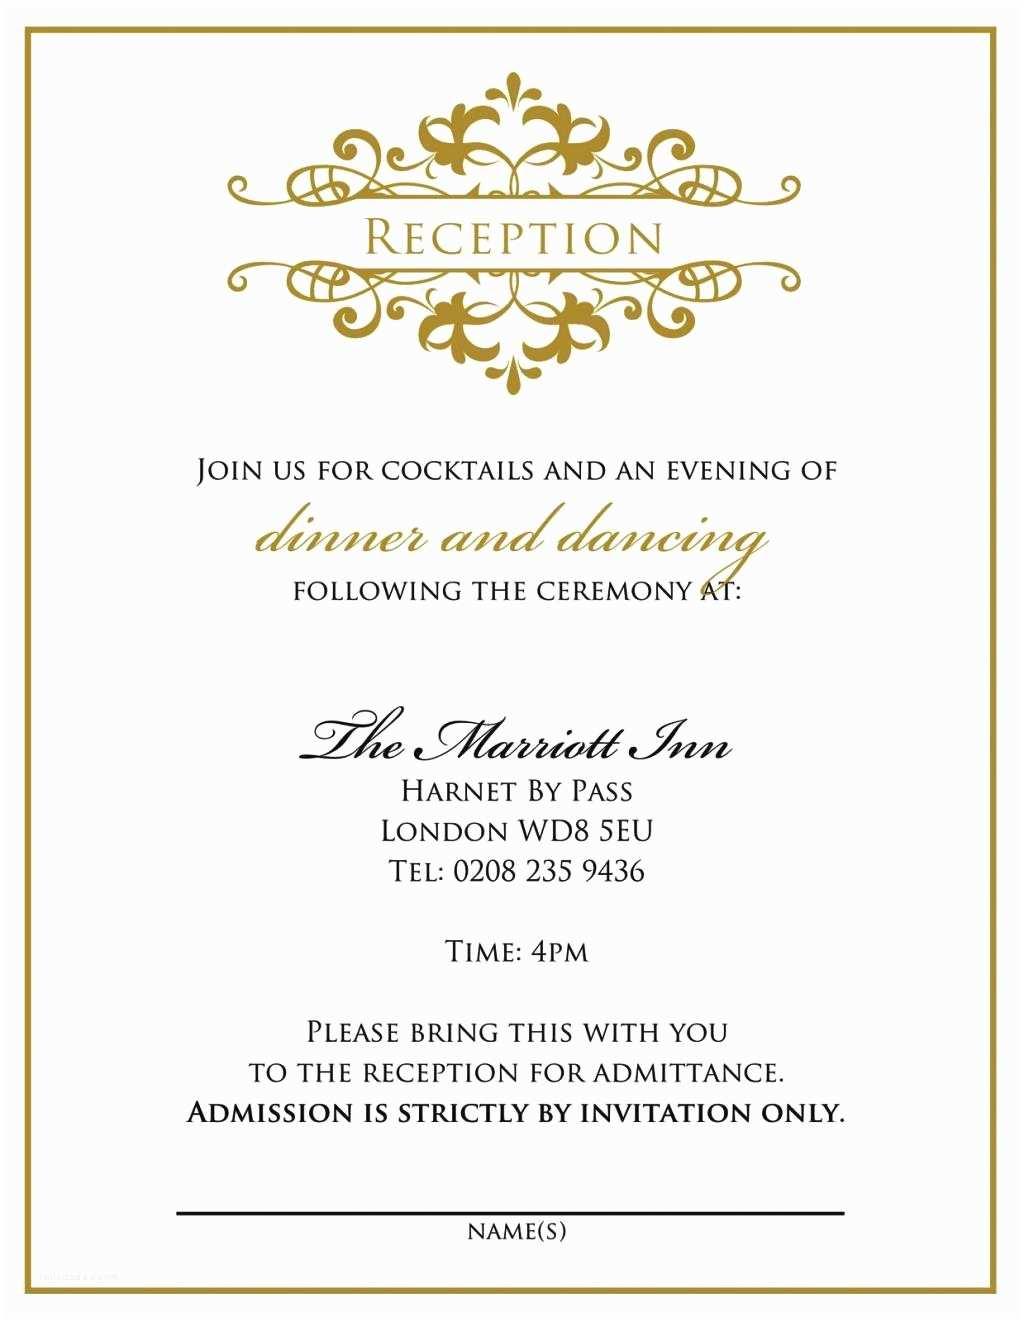 Wedding Invitation Wording for Friends Simple Wedding Invitation Wording for Friends Tamil